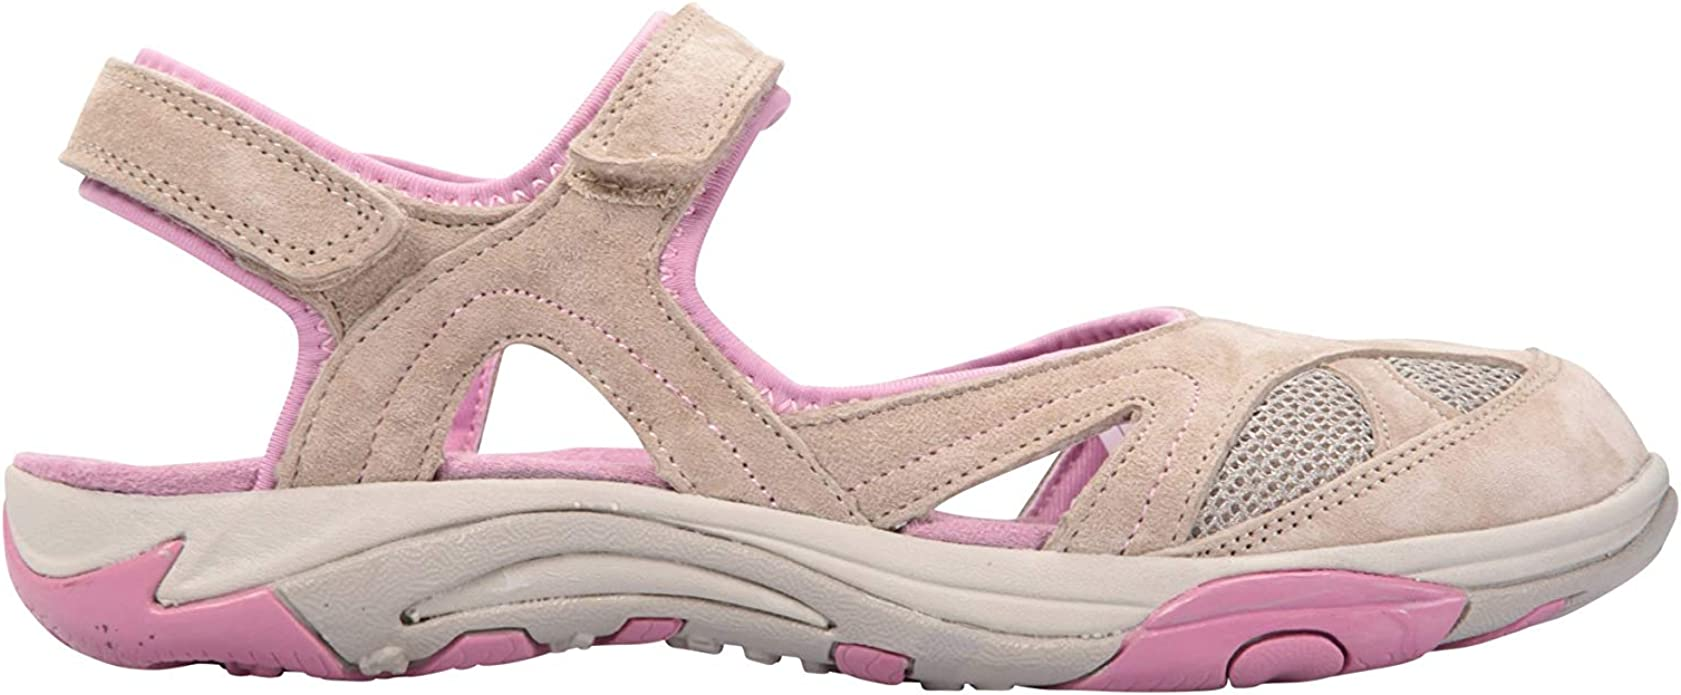 per Camminate Stile Casual Sandali coperti da Donna Leggeri Spiaggia Mountain Warehouse Bournemouth Resistenti Vacanze pratici Estivi